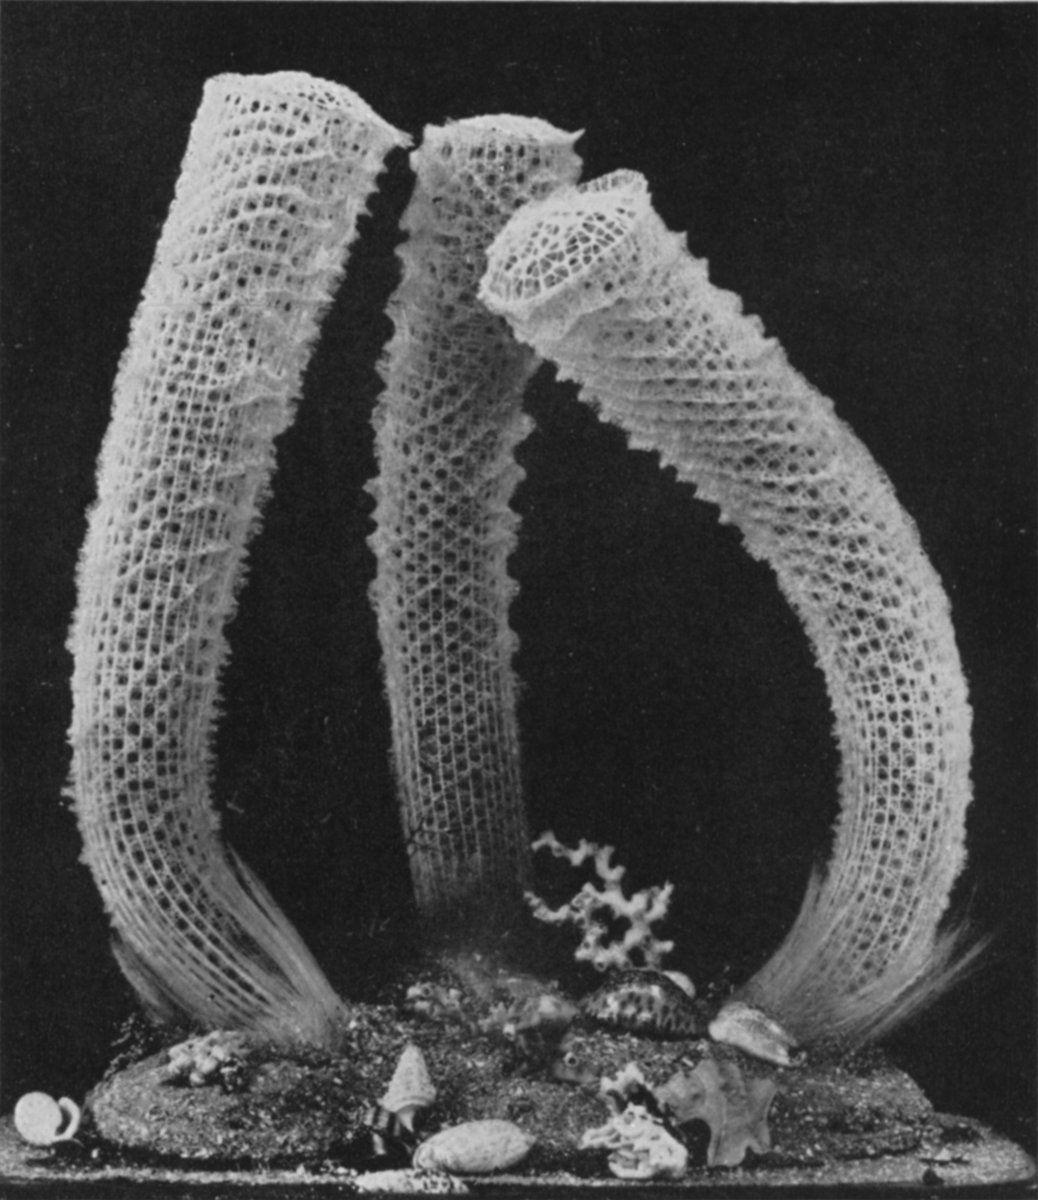 VENUS FLOWER BASKET (EUPLECTELLA) Sea sponge, Flower